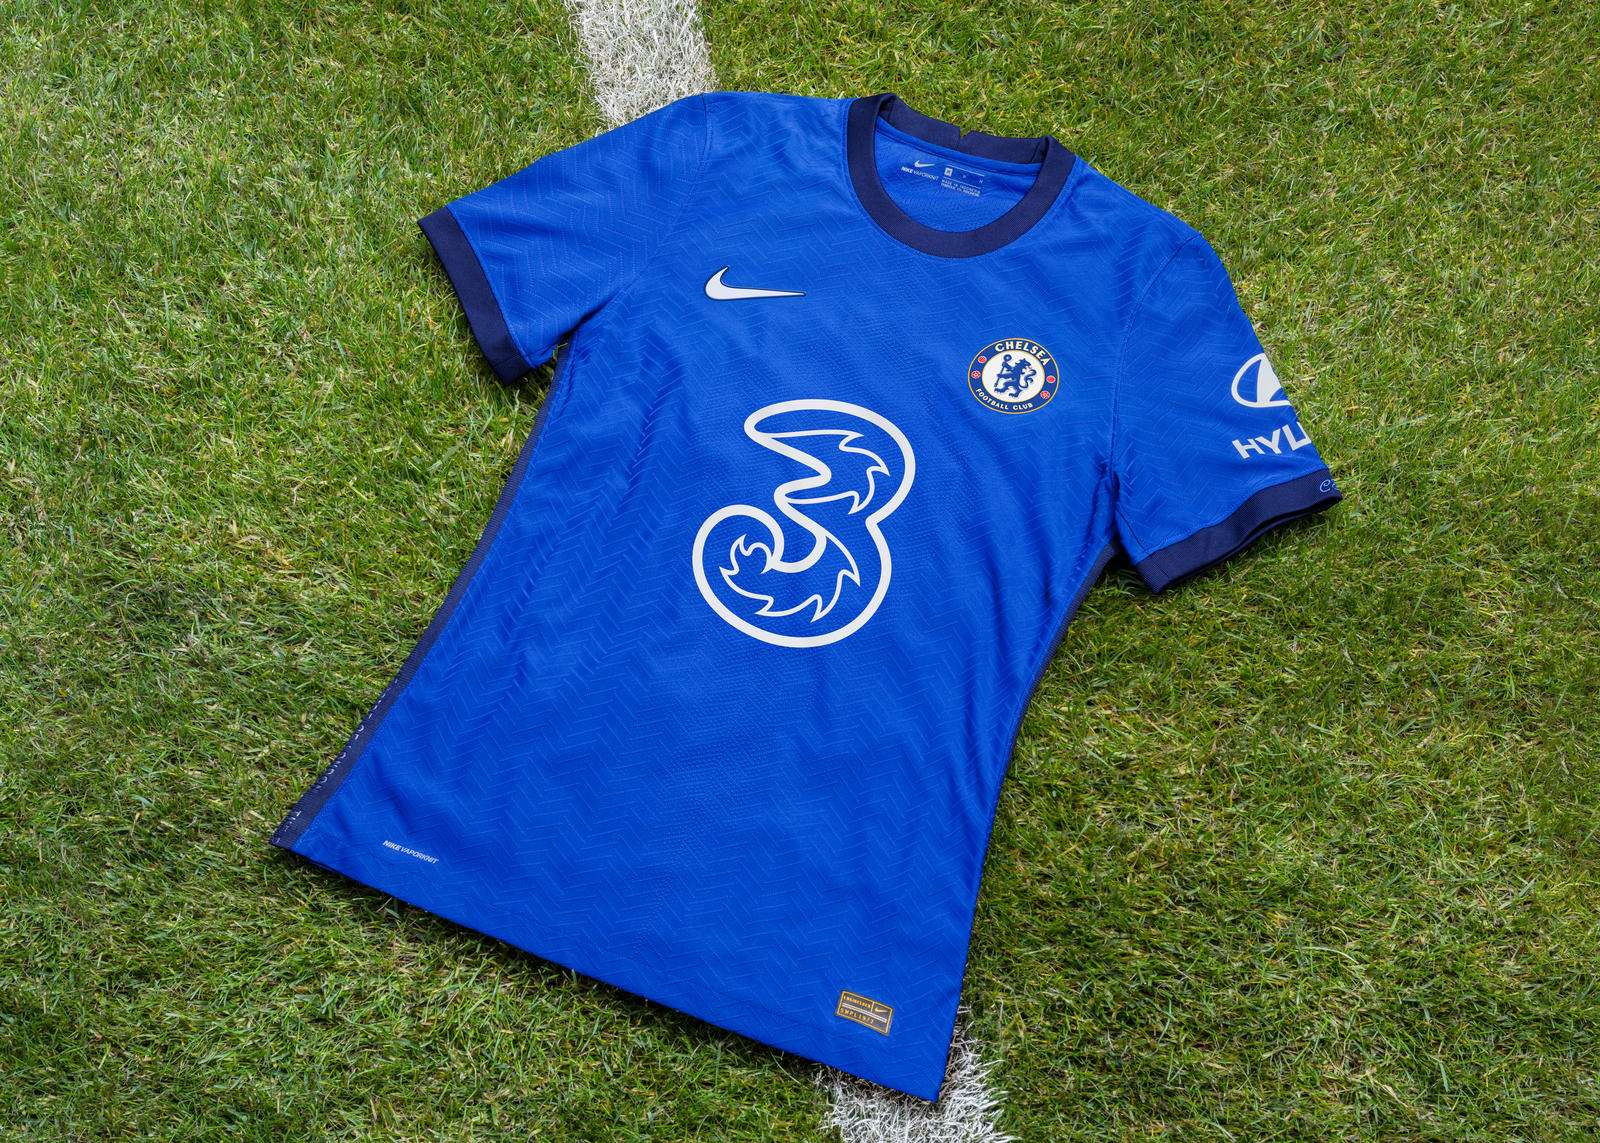 Chelsea Fc Sign Brazil Legend Thiago Silva From Psg